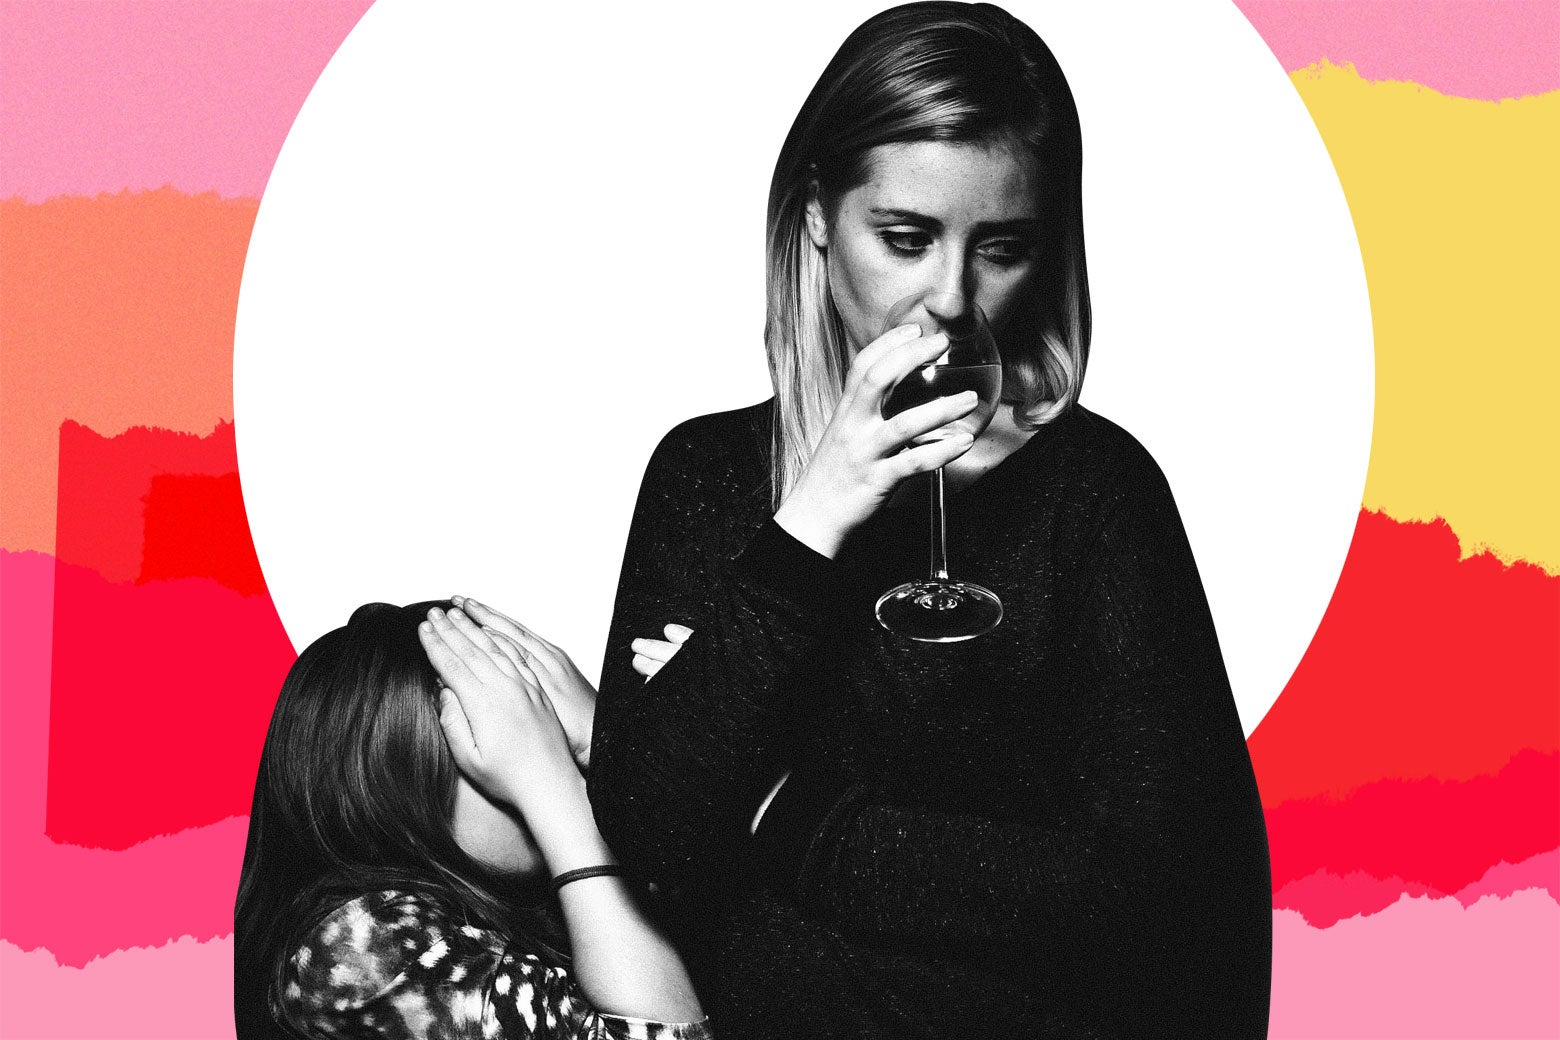 ELVIRA: Drank all my wifes piss